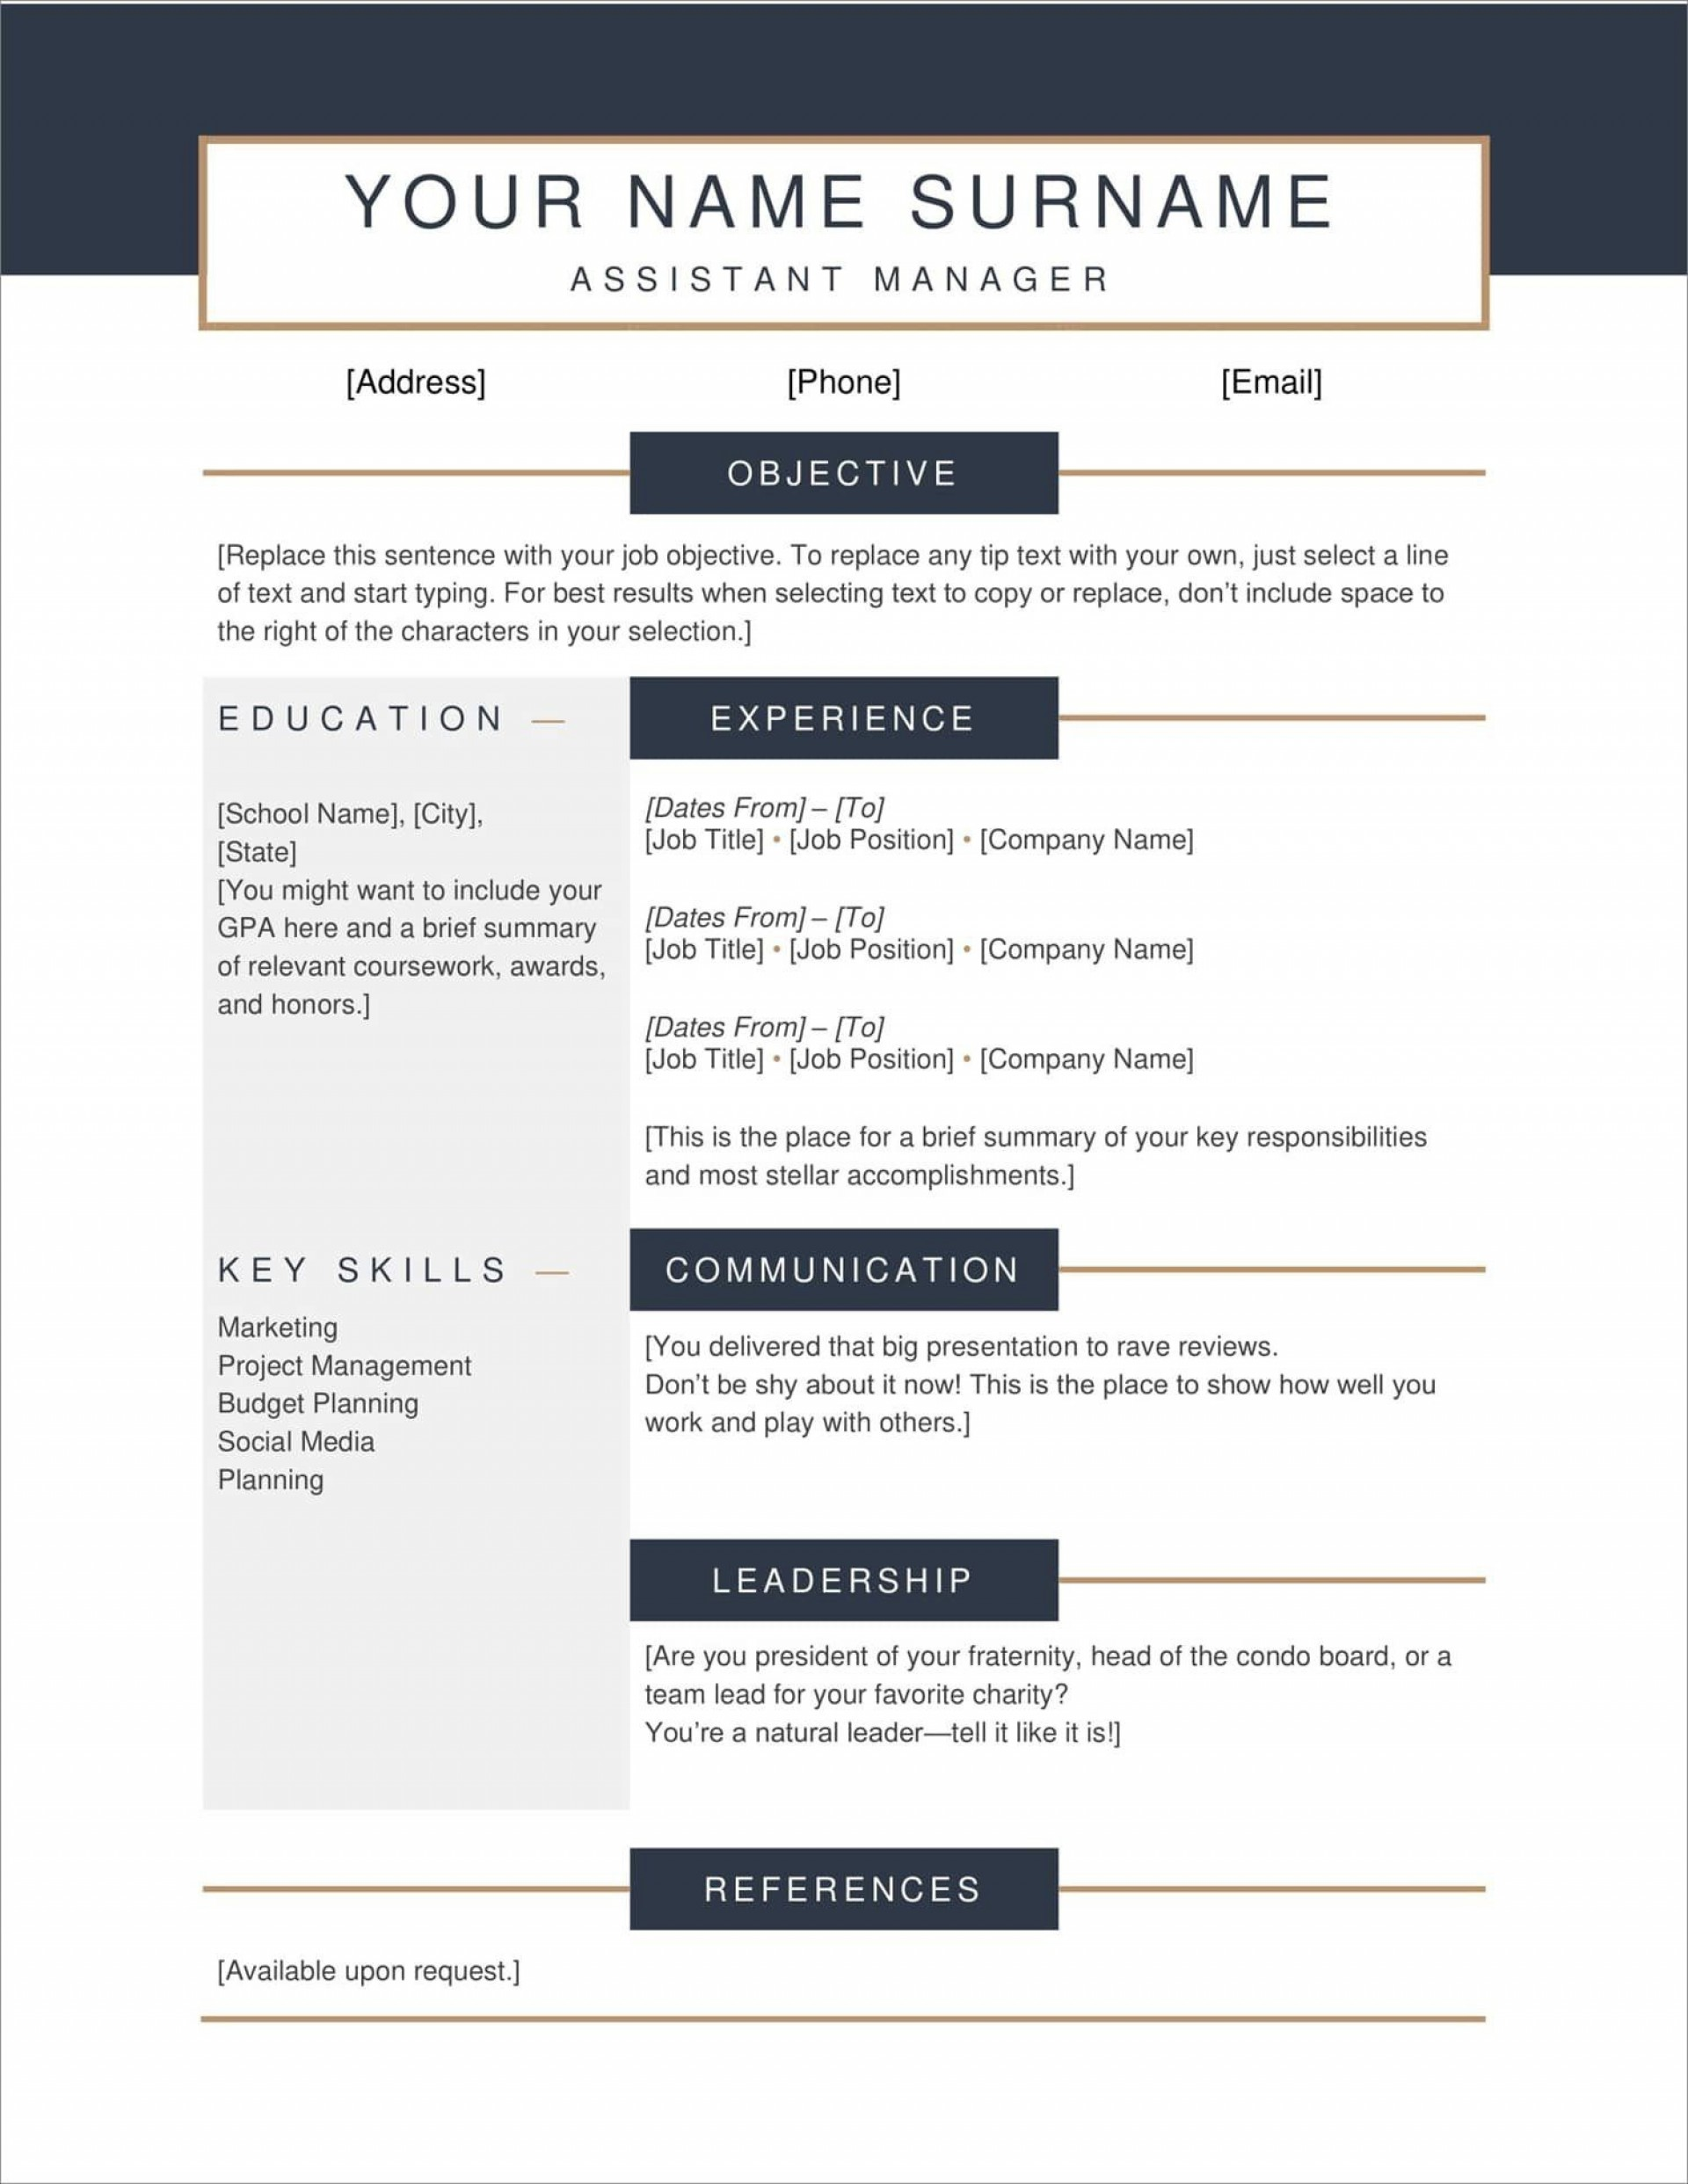 005 Imposing Free Printable Resume Template Download Image 1920